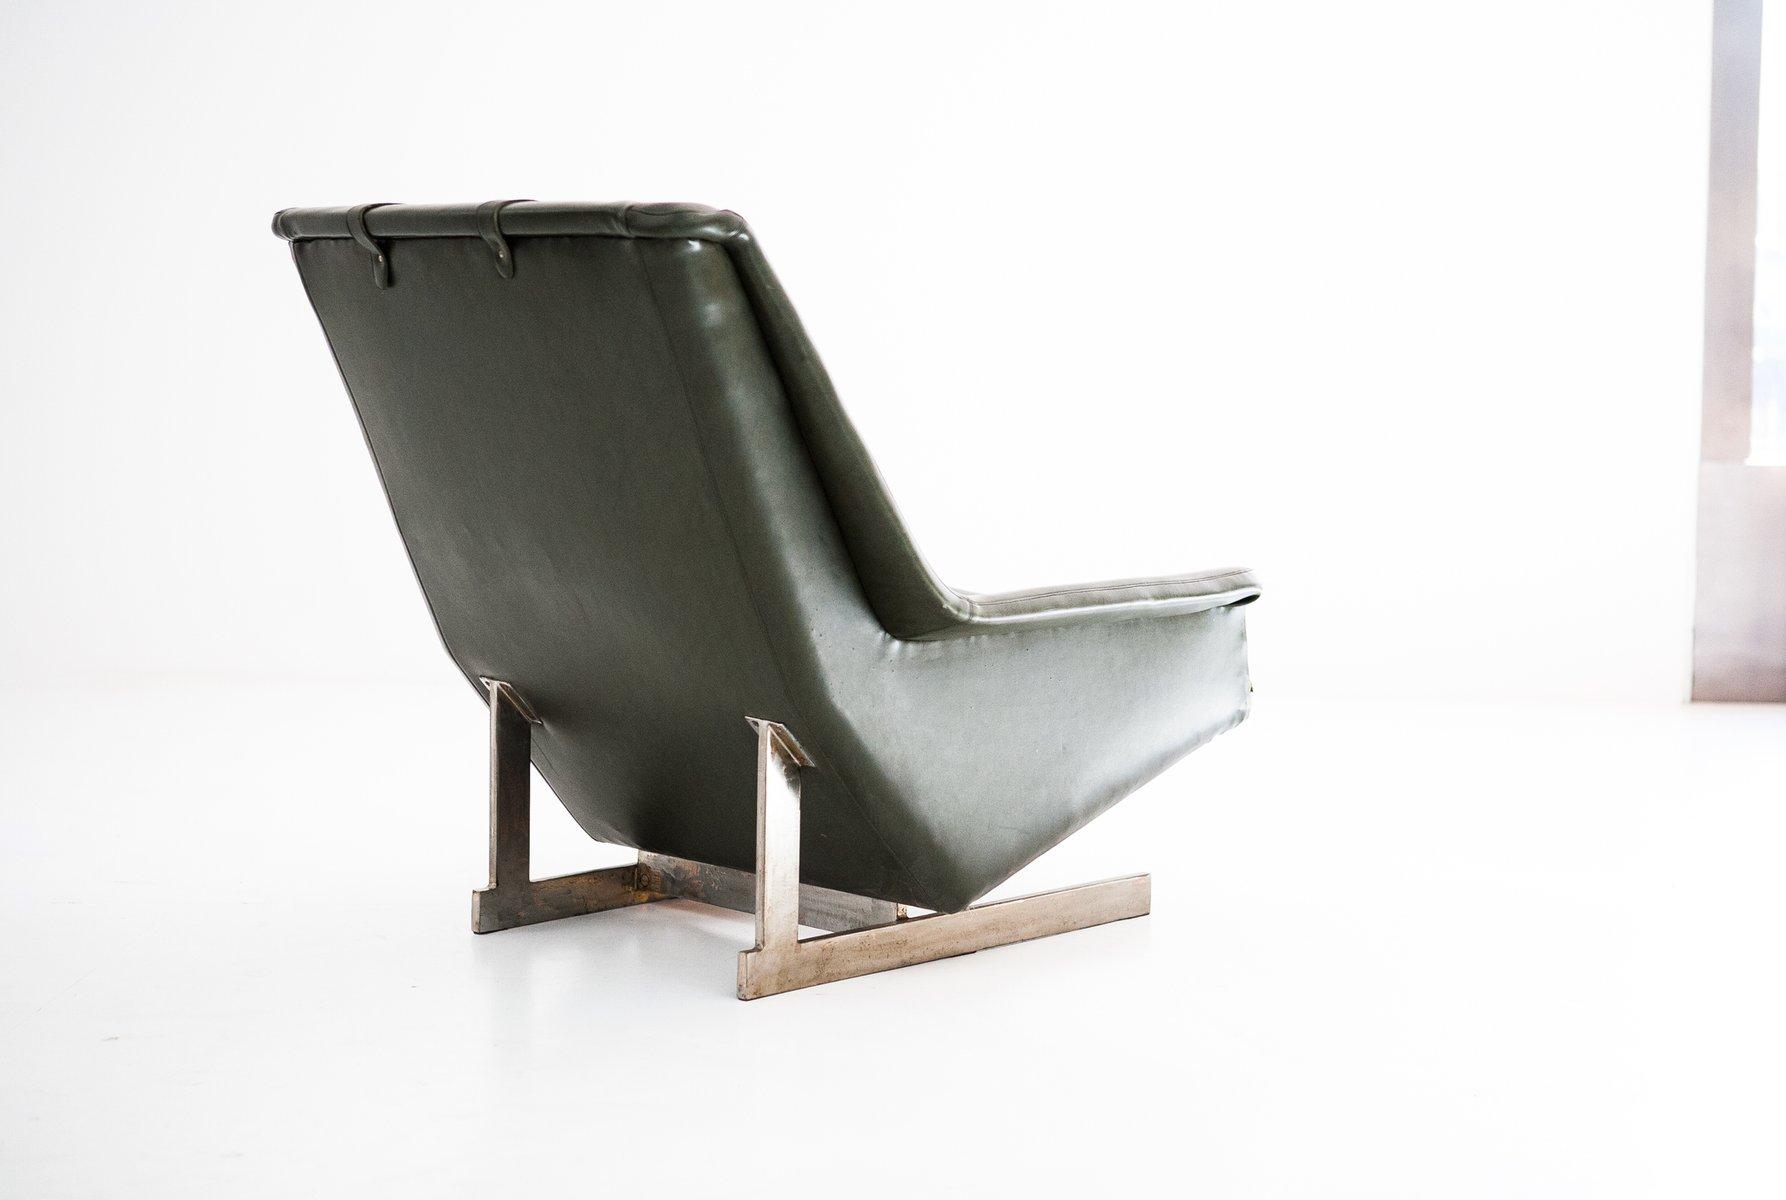 Chaise Longue Prezzi Bassi. Lc Poltrona Stile Le Corbusier Bauhaus ...